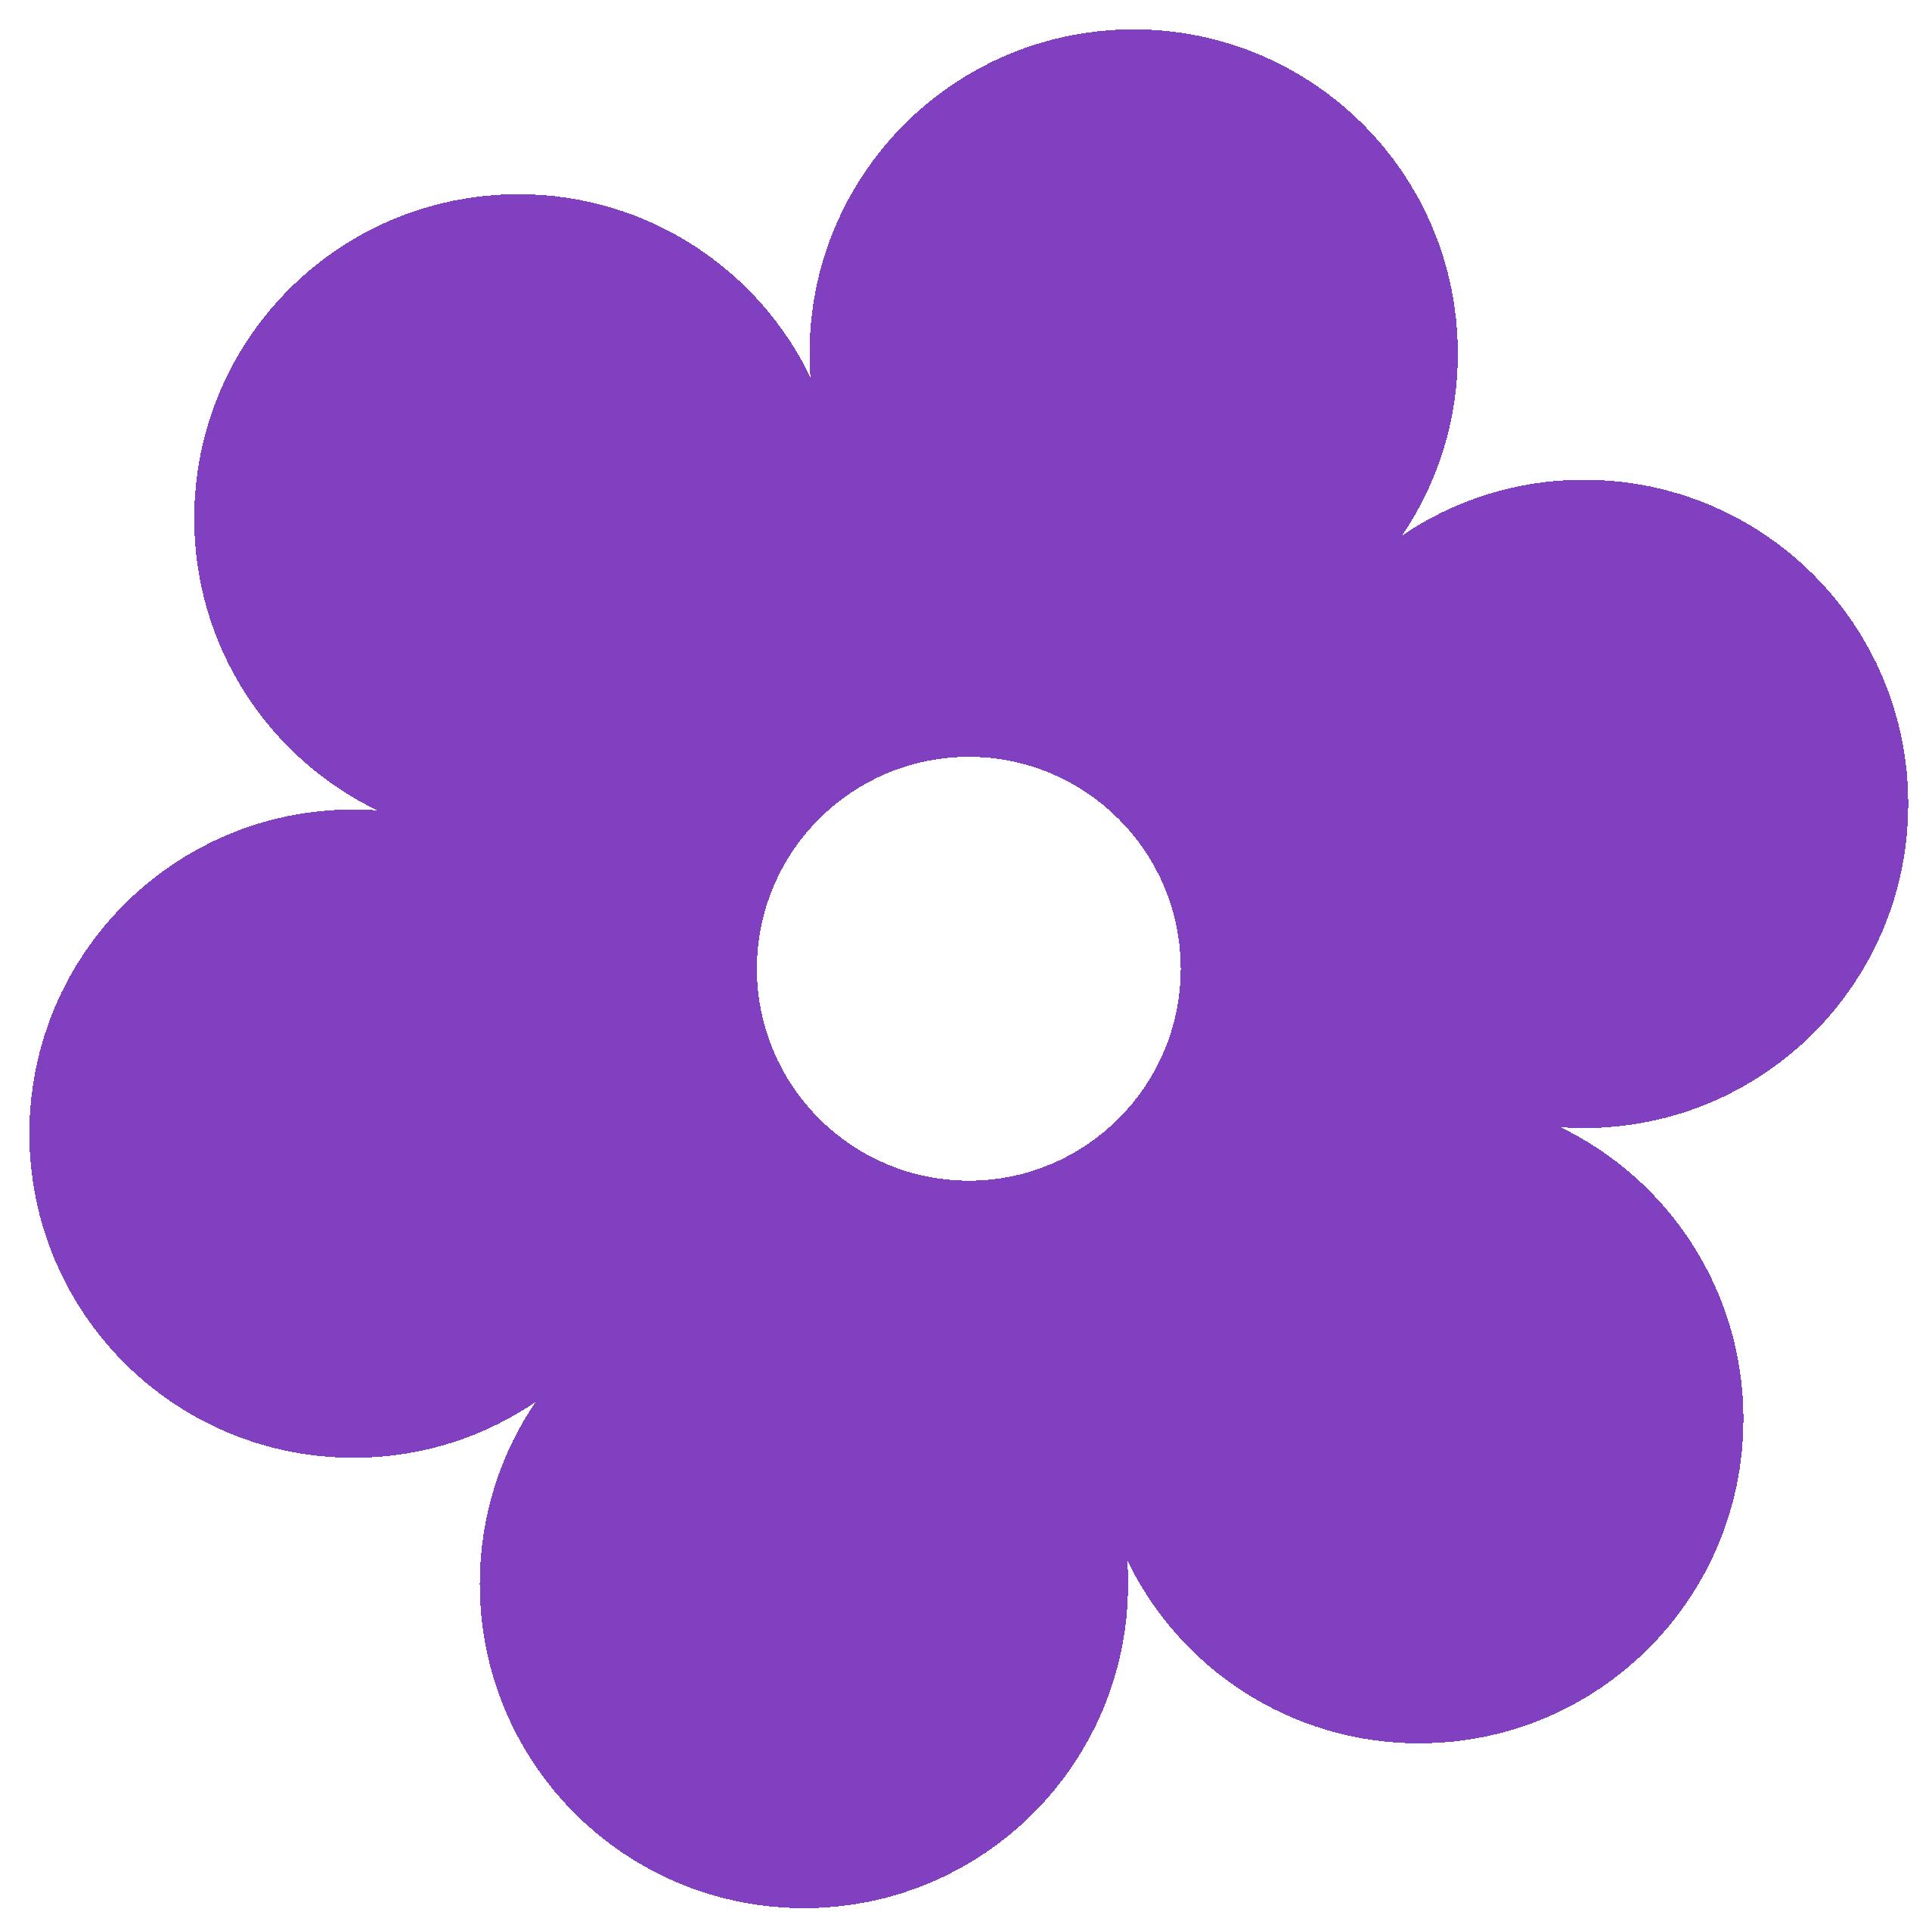 Retro Flower Clip Art